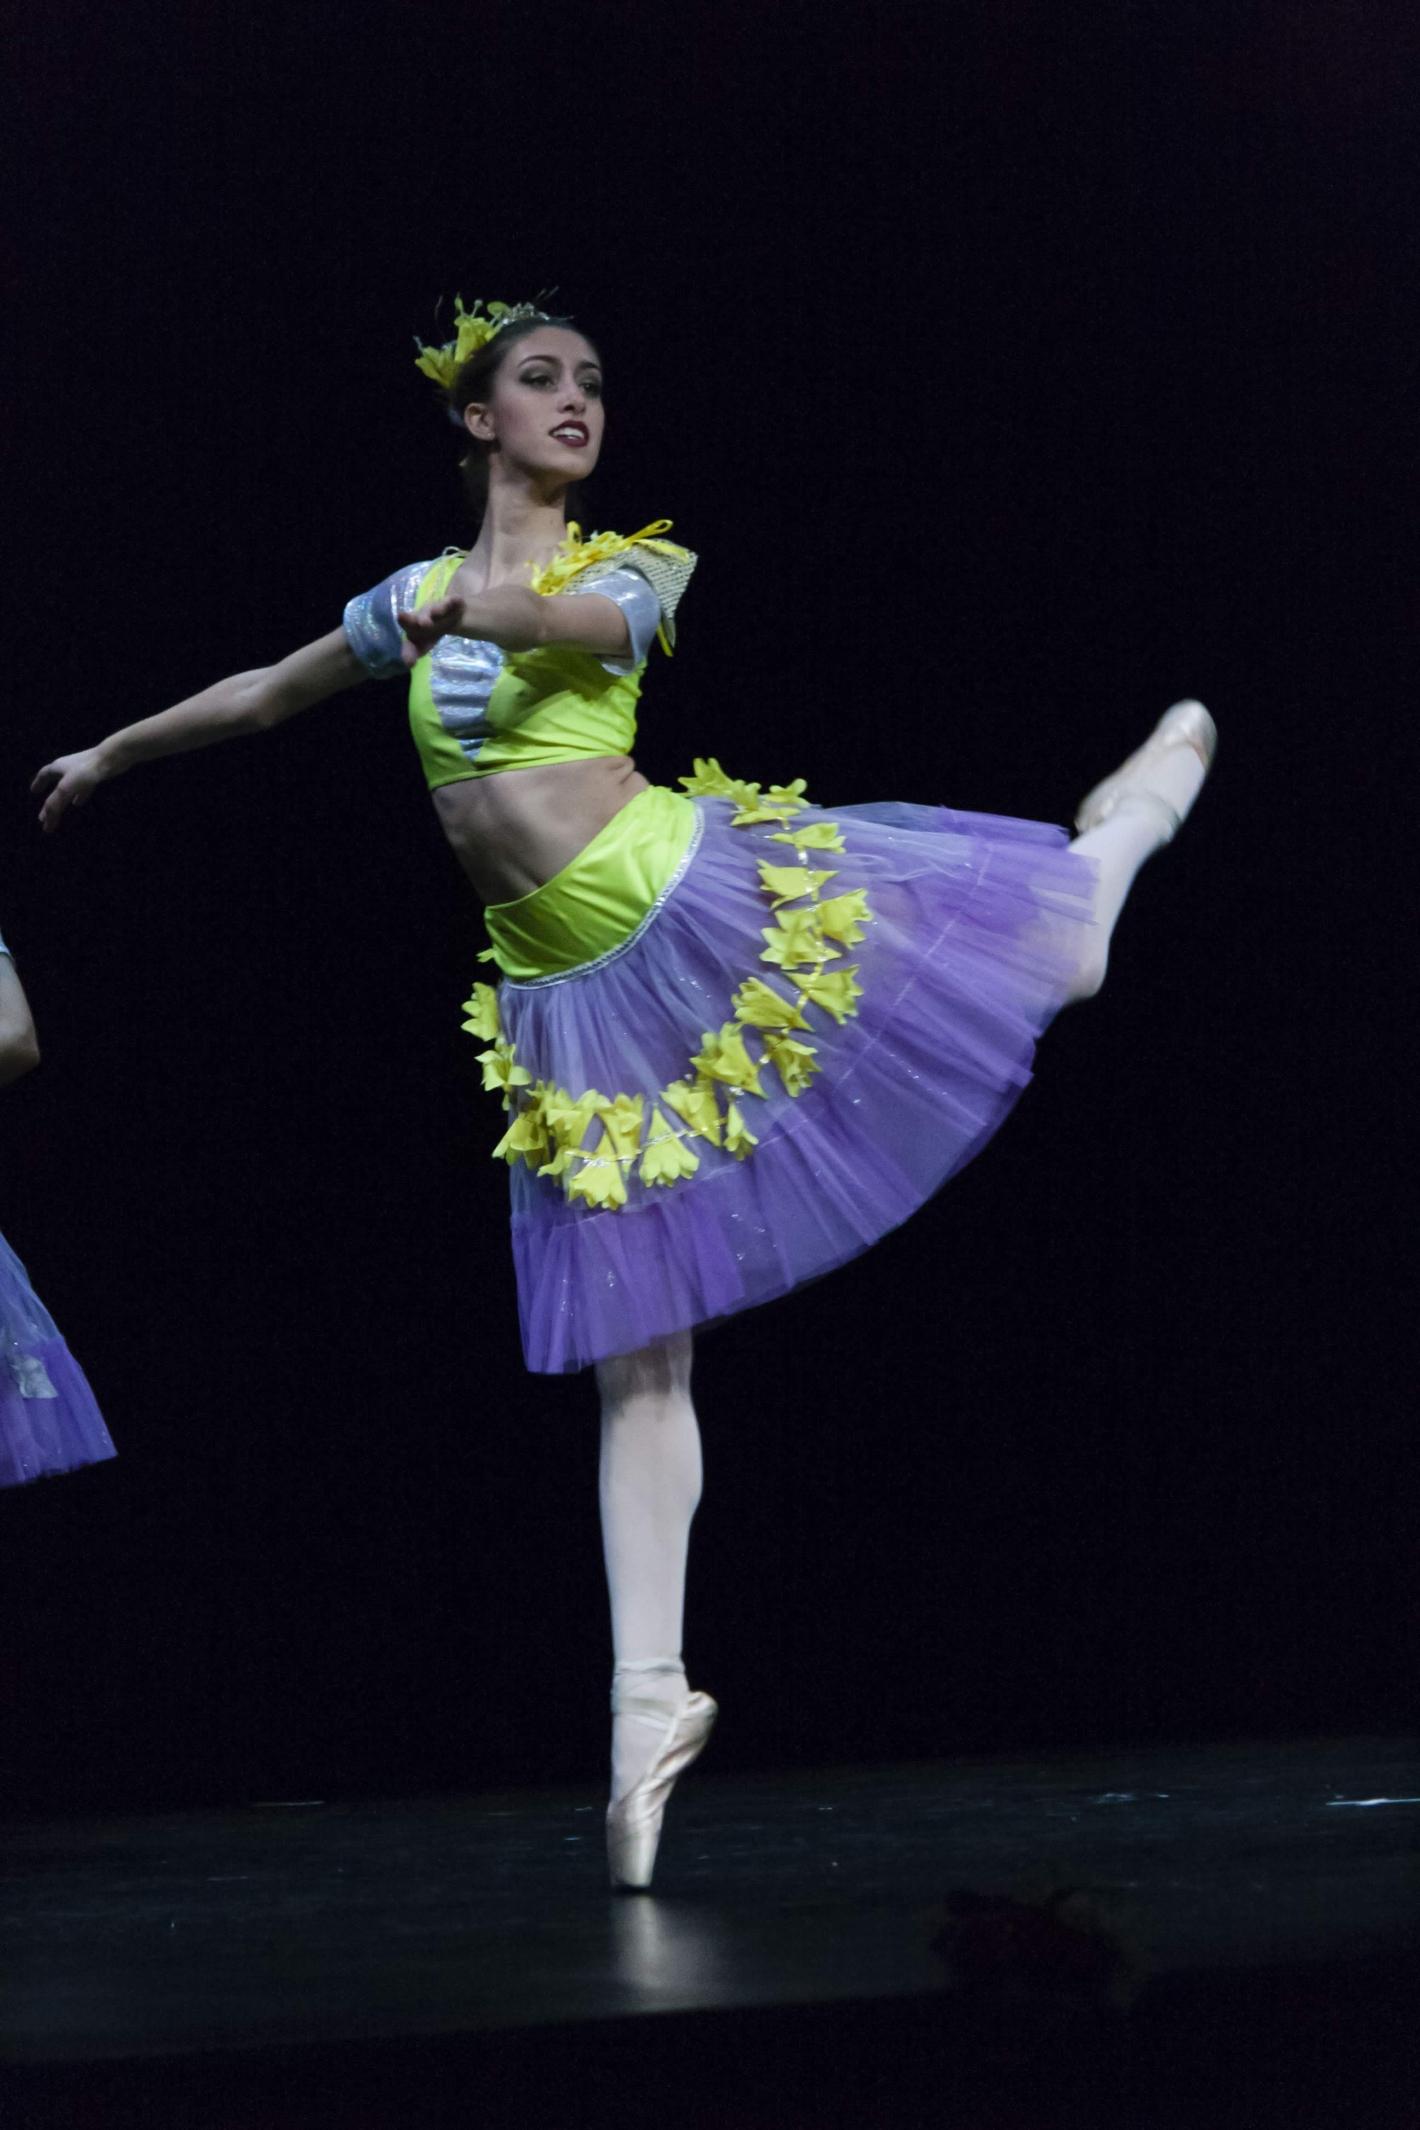 clases ballet profesional granada laura